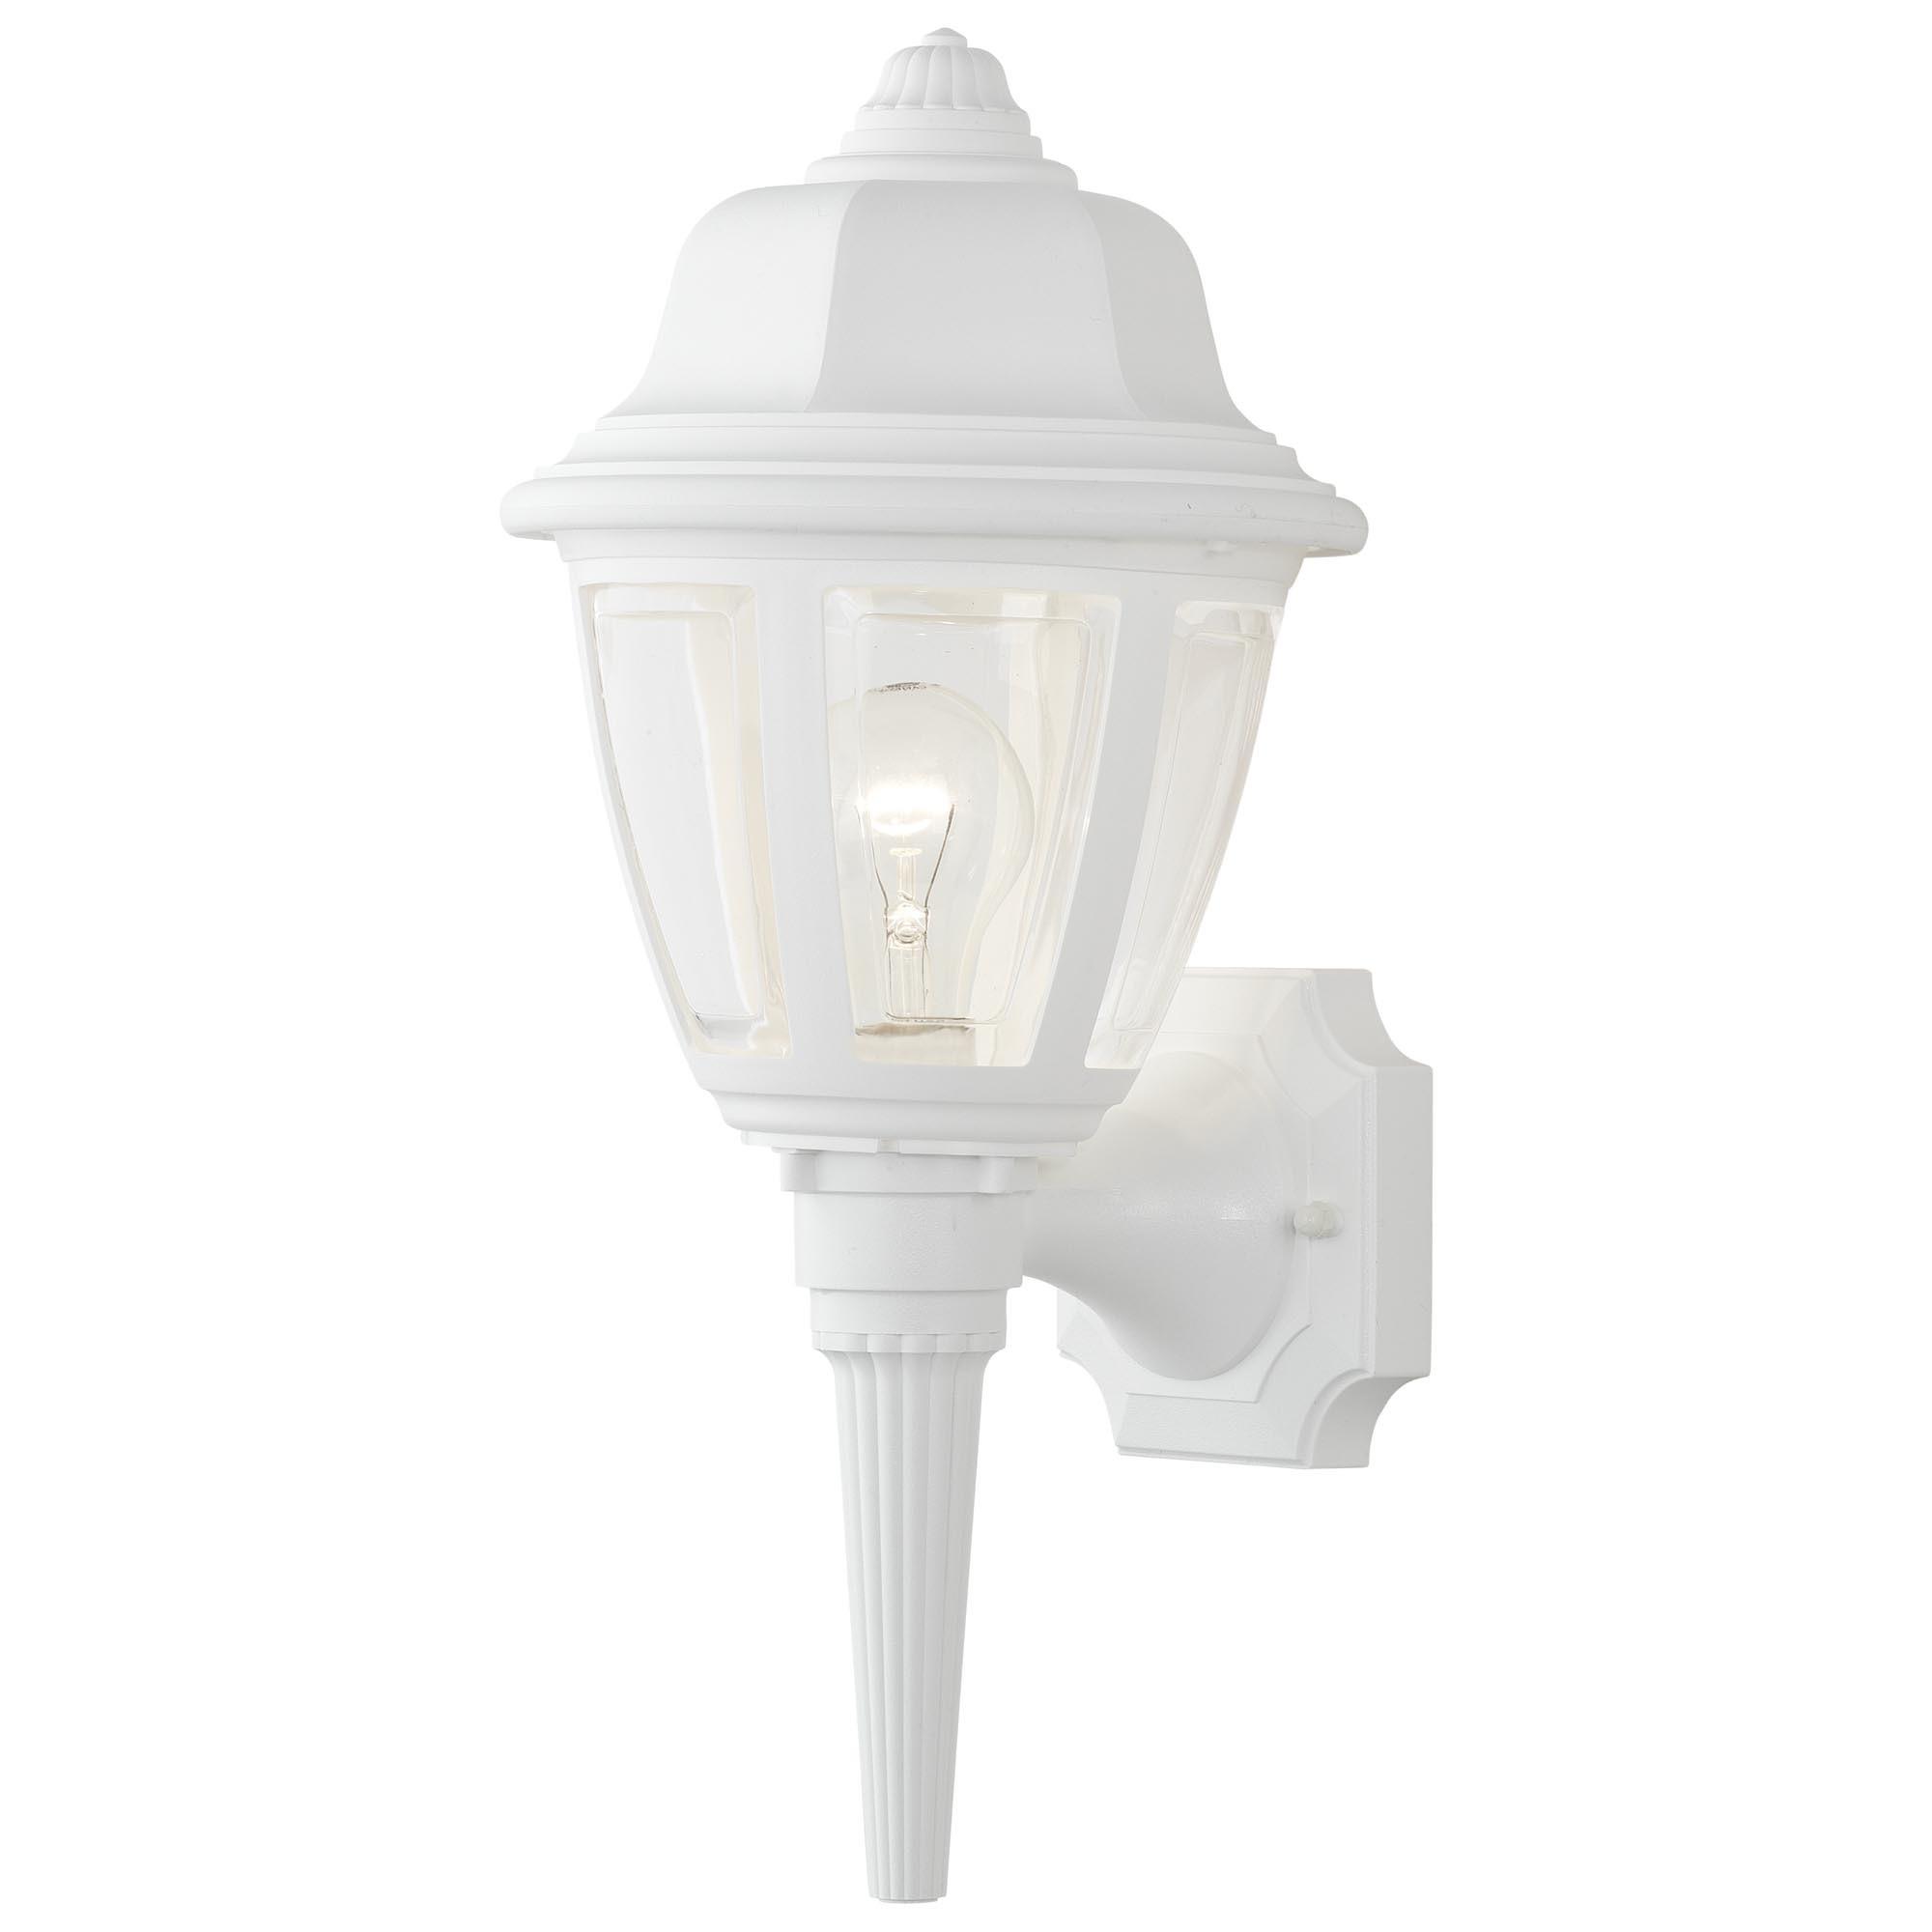 Sevenstonesinc Pertaining To Trendy Resin Outdoor Lanterns (View 9 of 20)